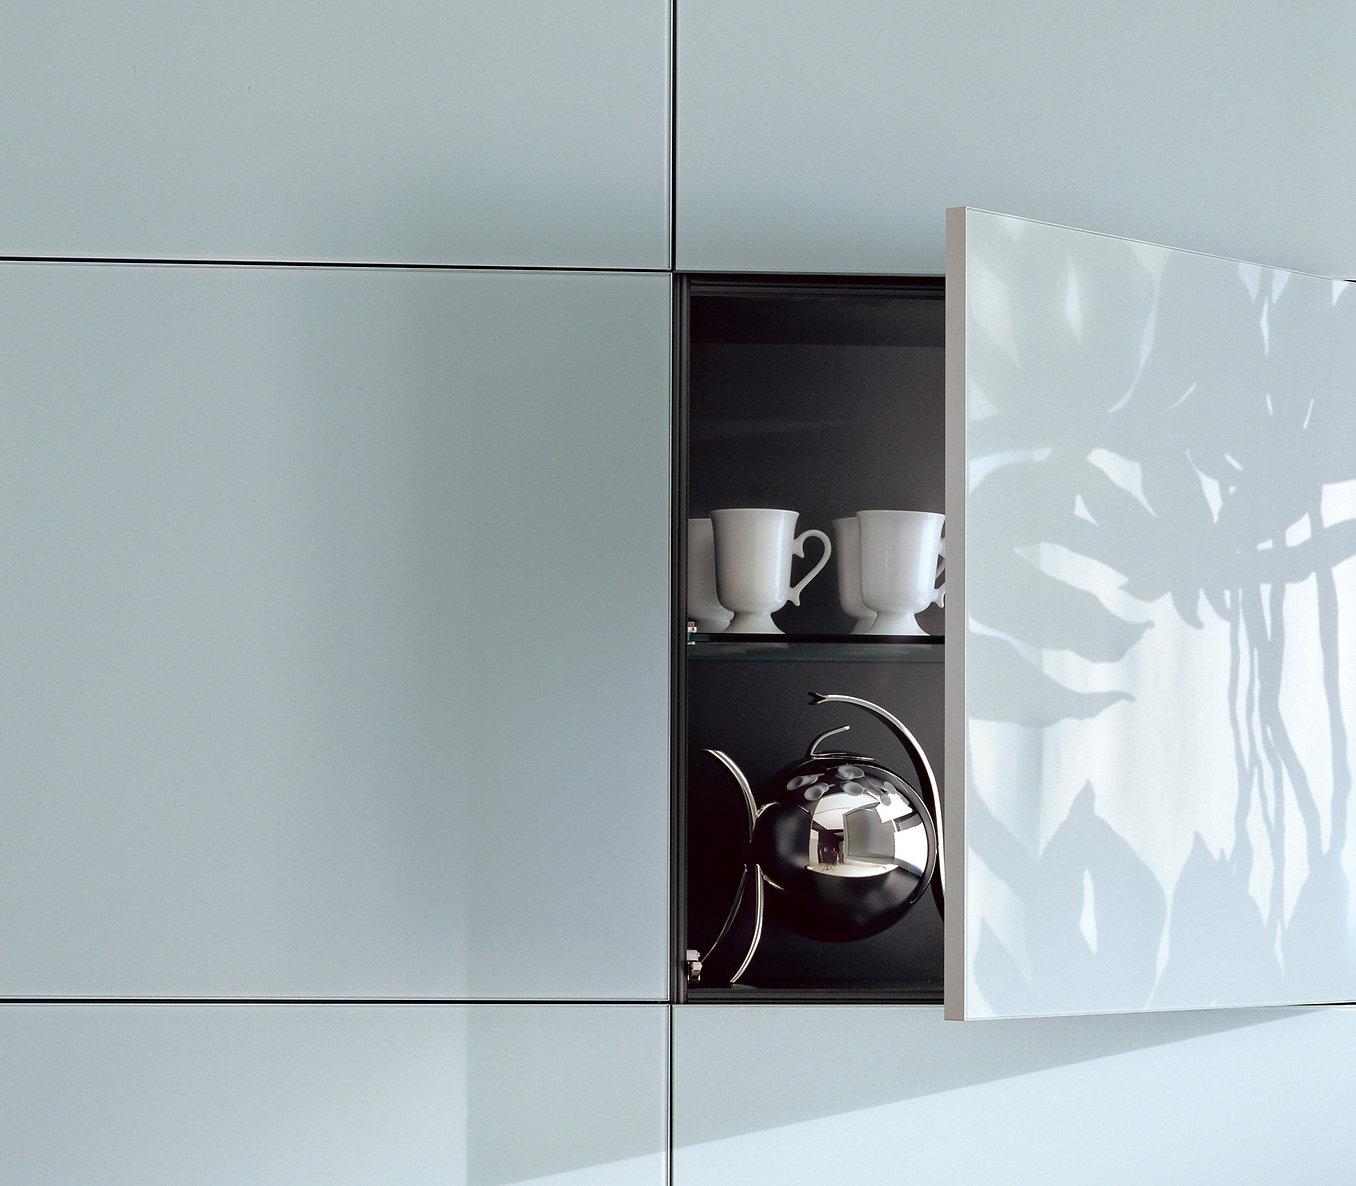 Pedini calgary modern italian kitchens for Pedini cabinets